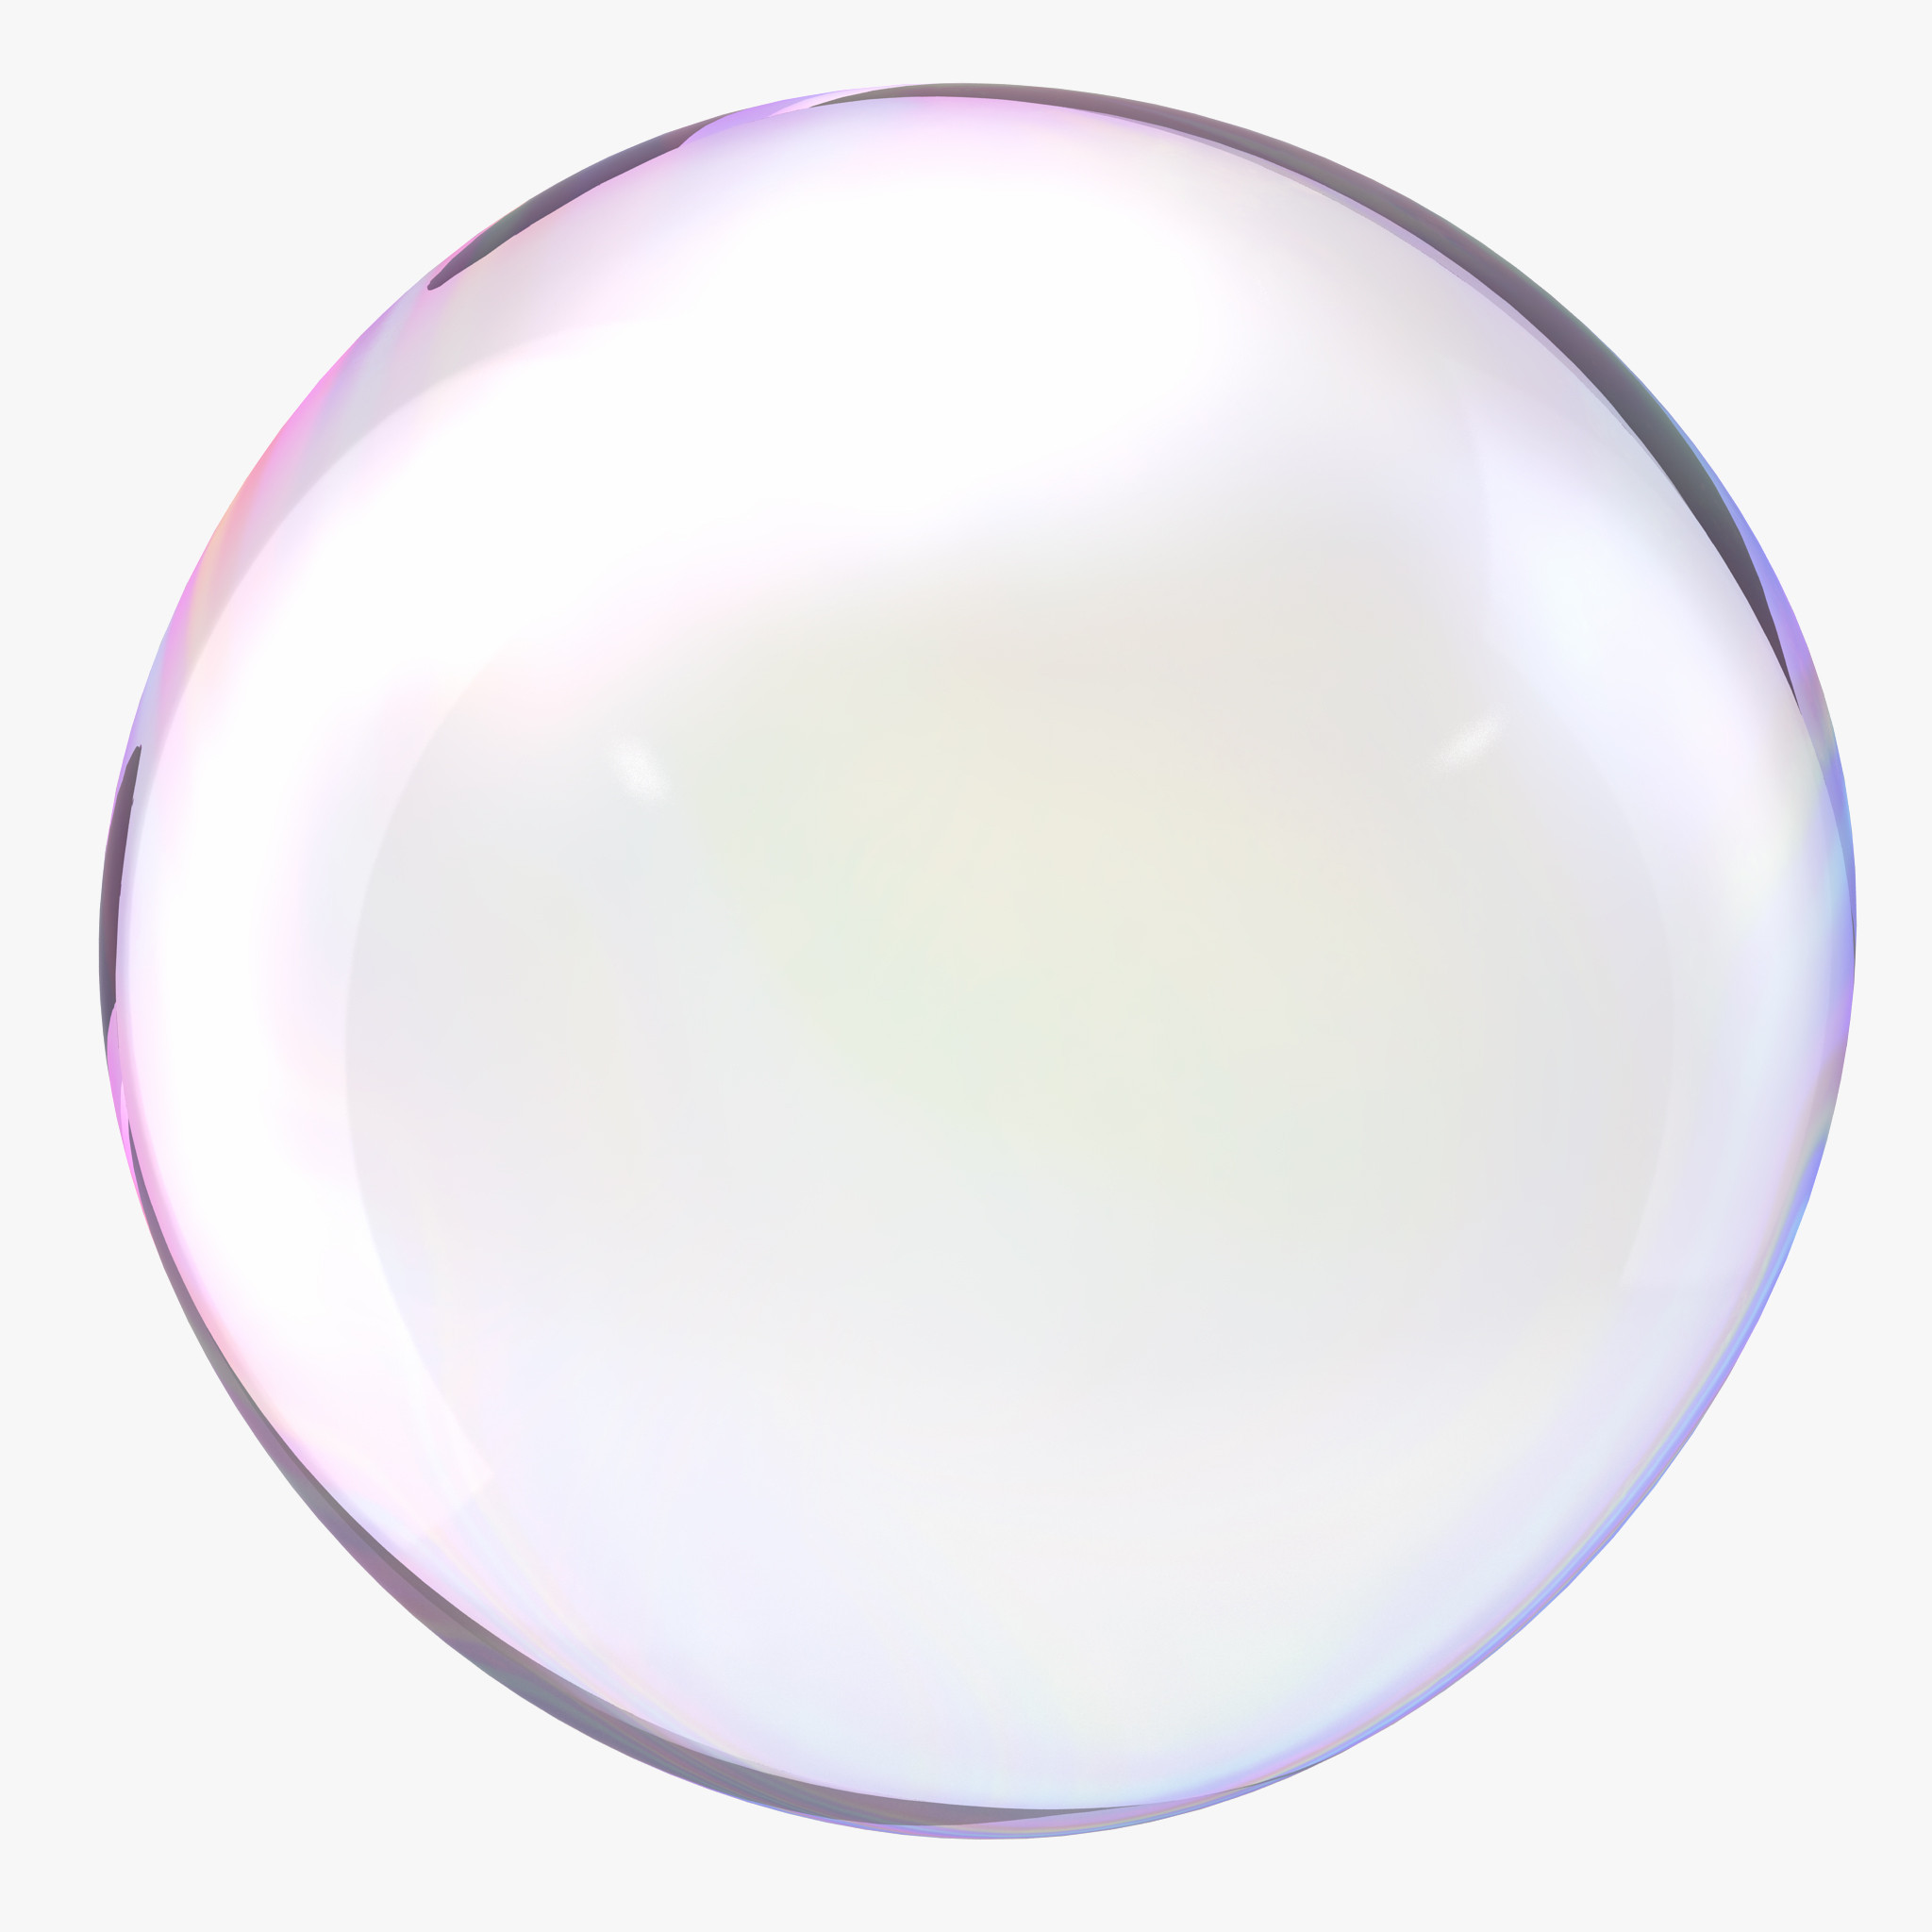 Amazing Bubble Pictures & Backgrounds